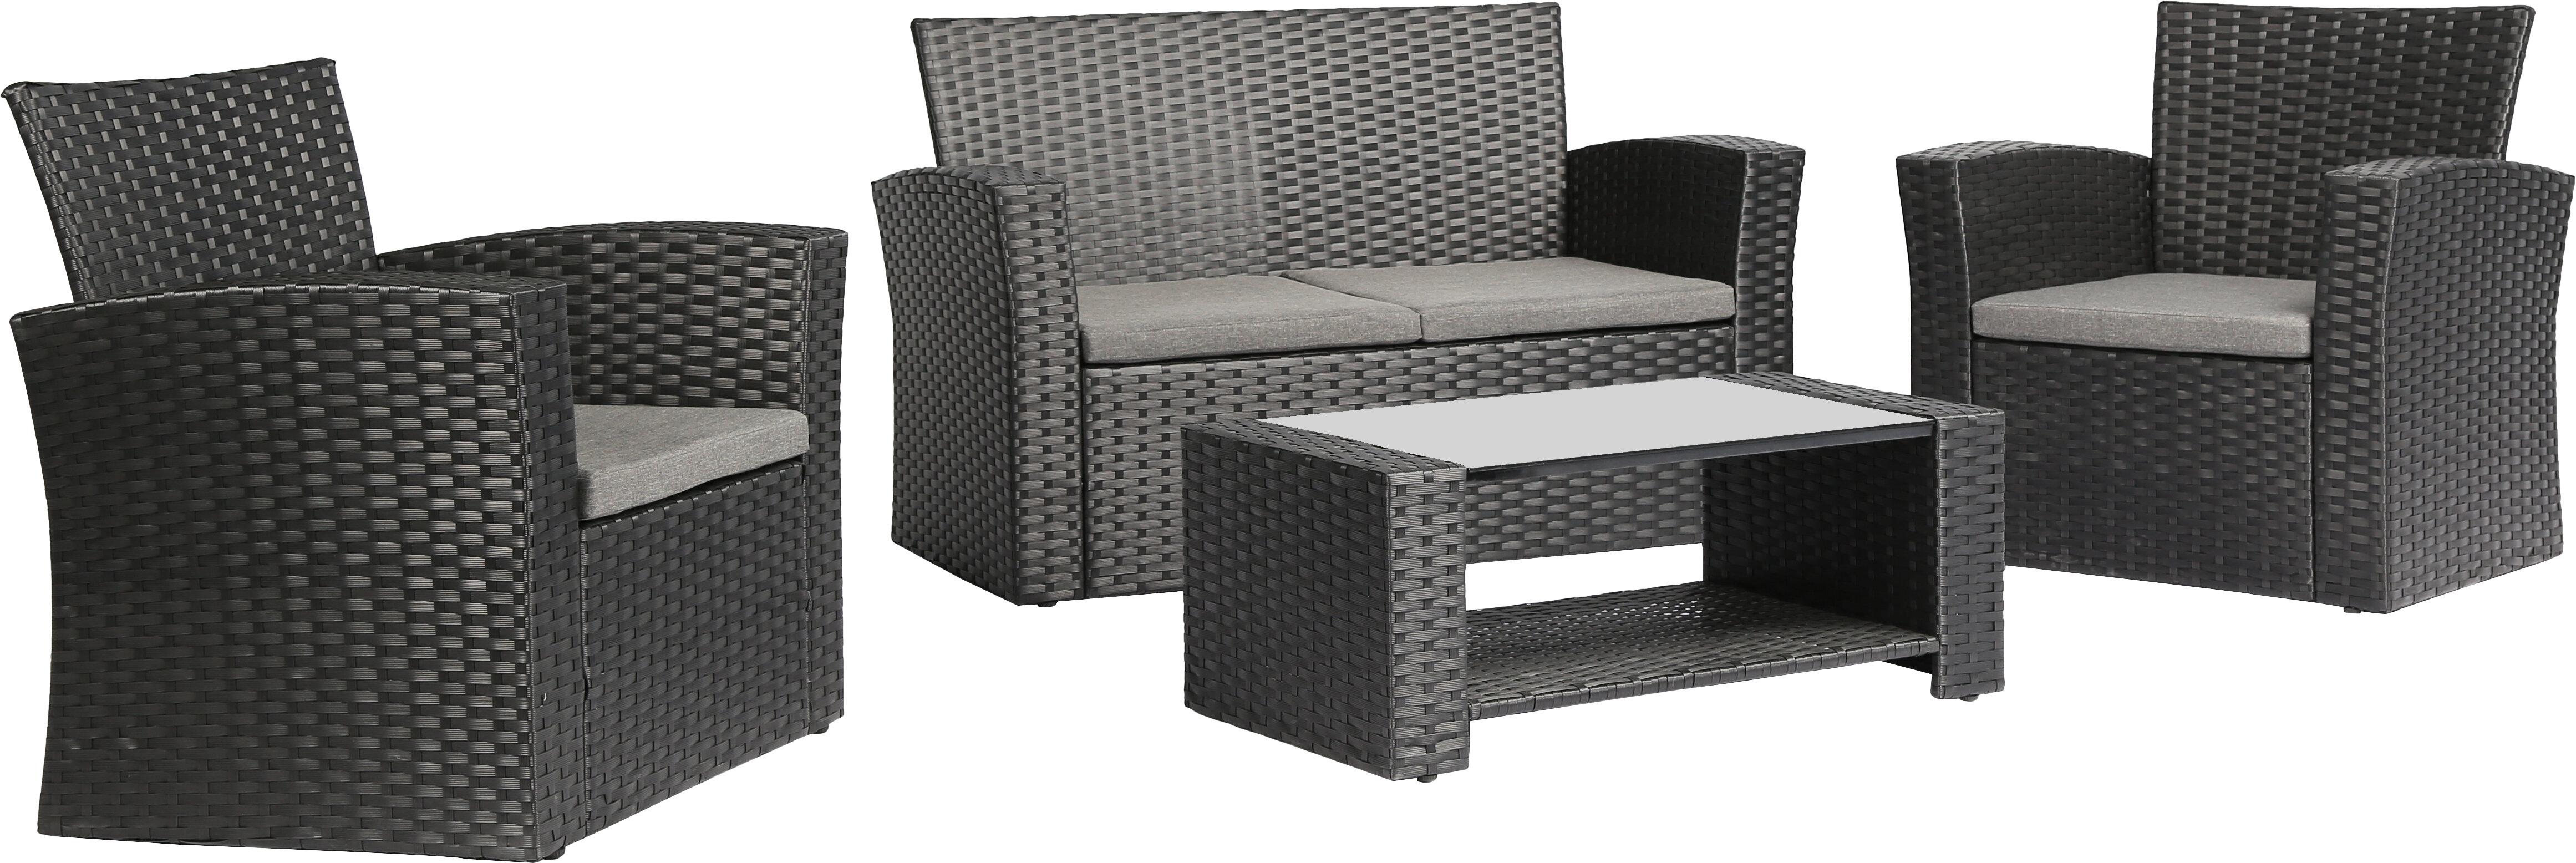 Charmain Sofa Set Sofa Seating Group with Cushions